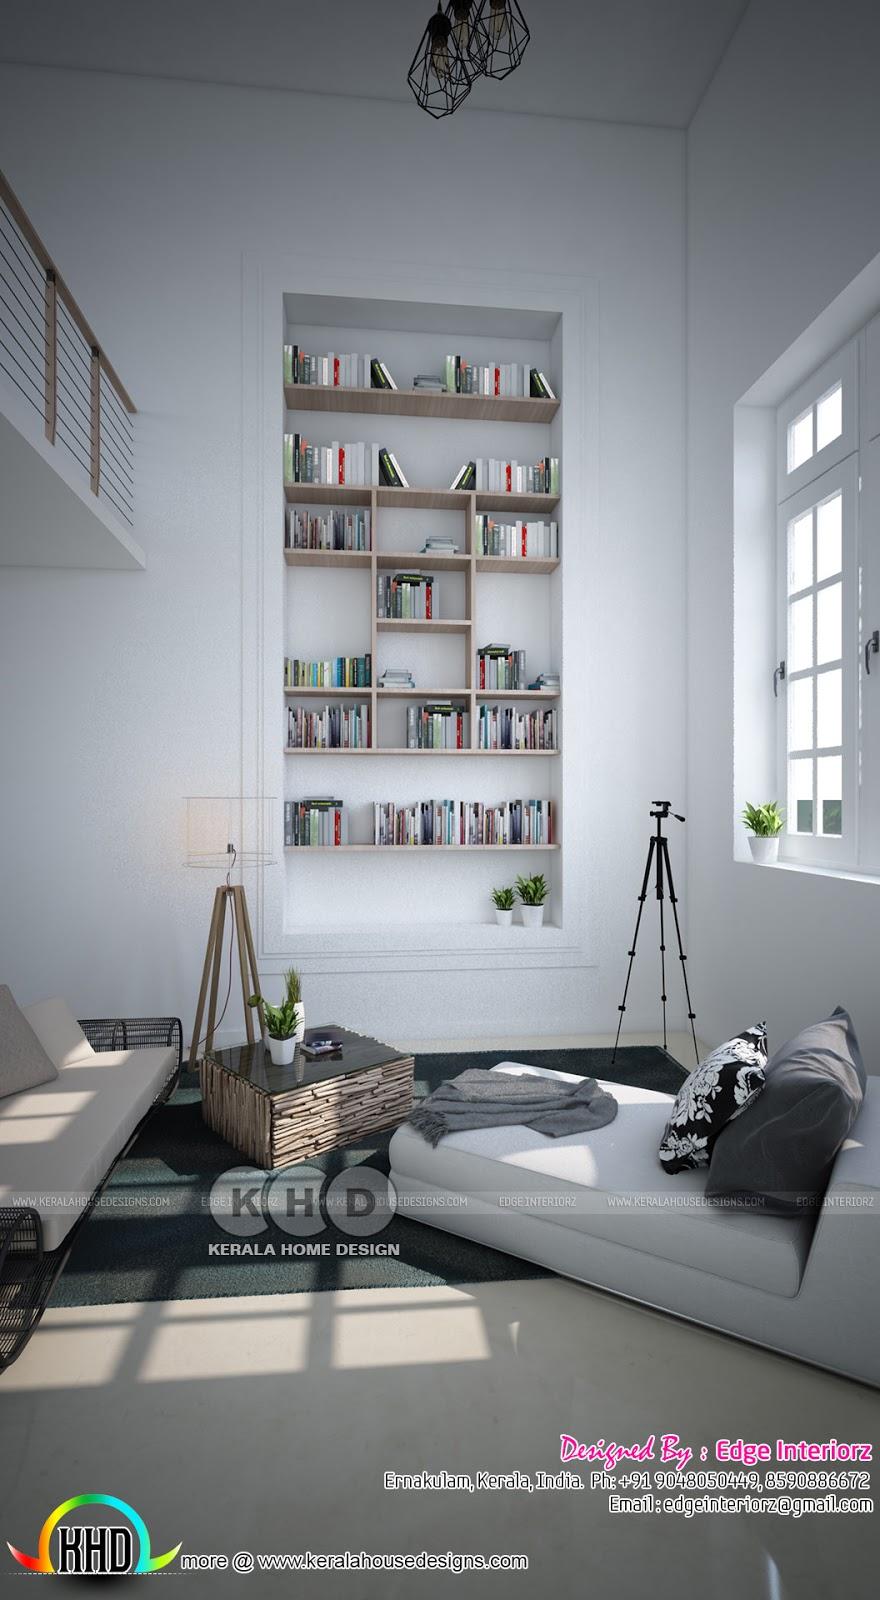 Home interior design by edge interiorz kerala home for Edge house design